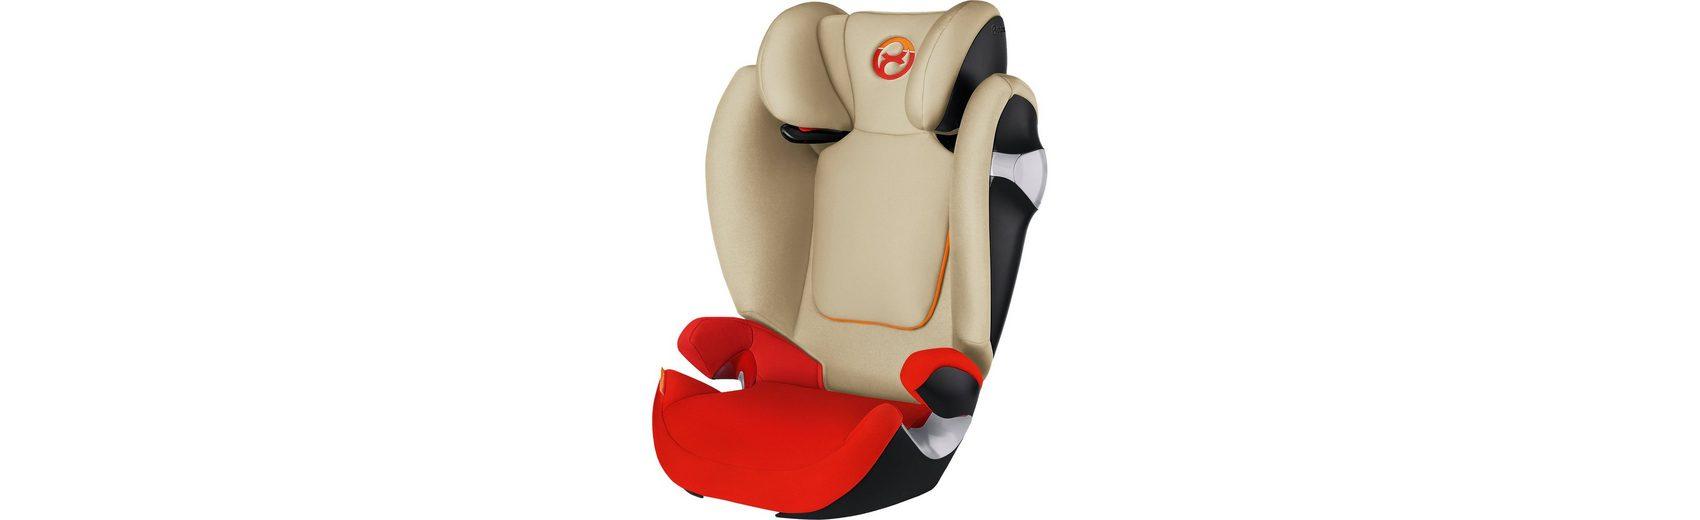 Cybex Auto-Kindersitz Solution M, Gold-Line, Autumn Gold-Burnt Red